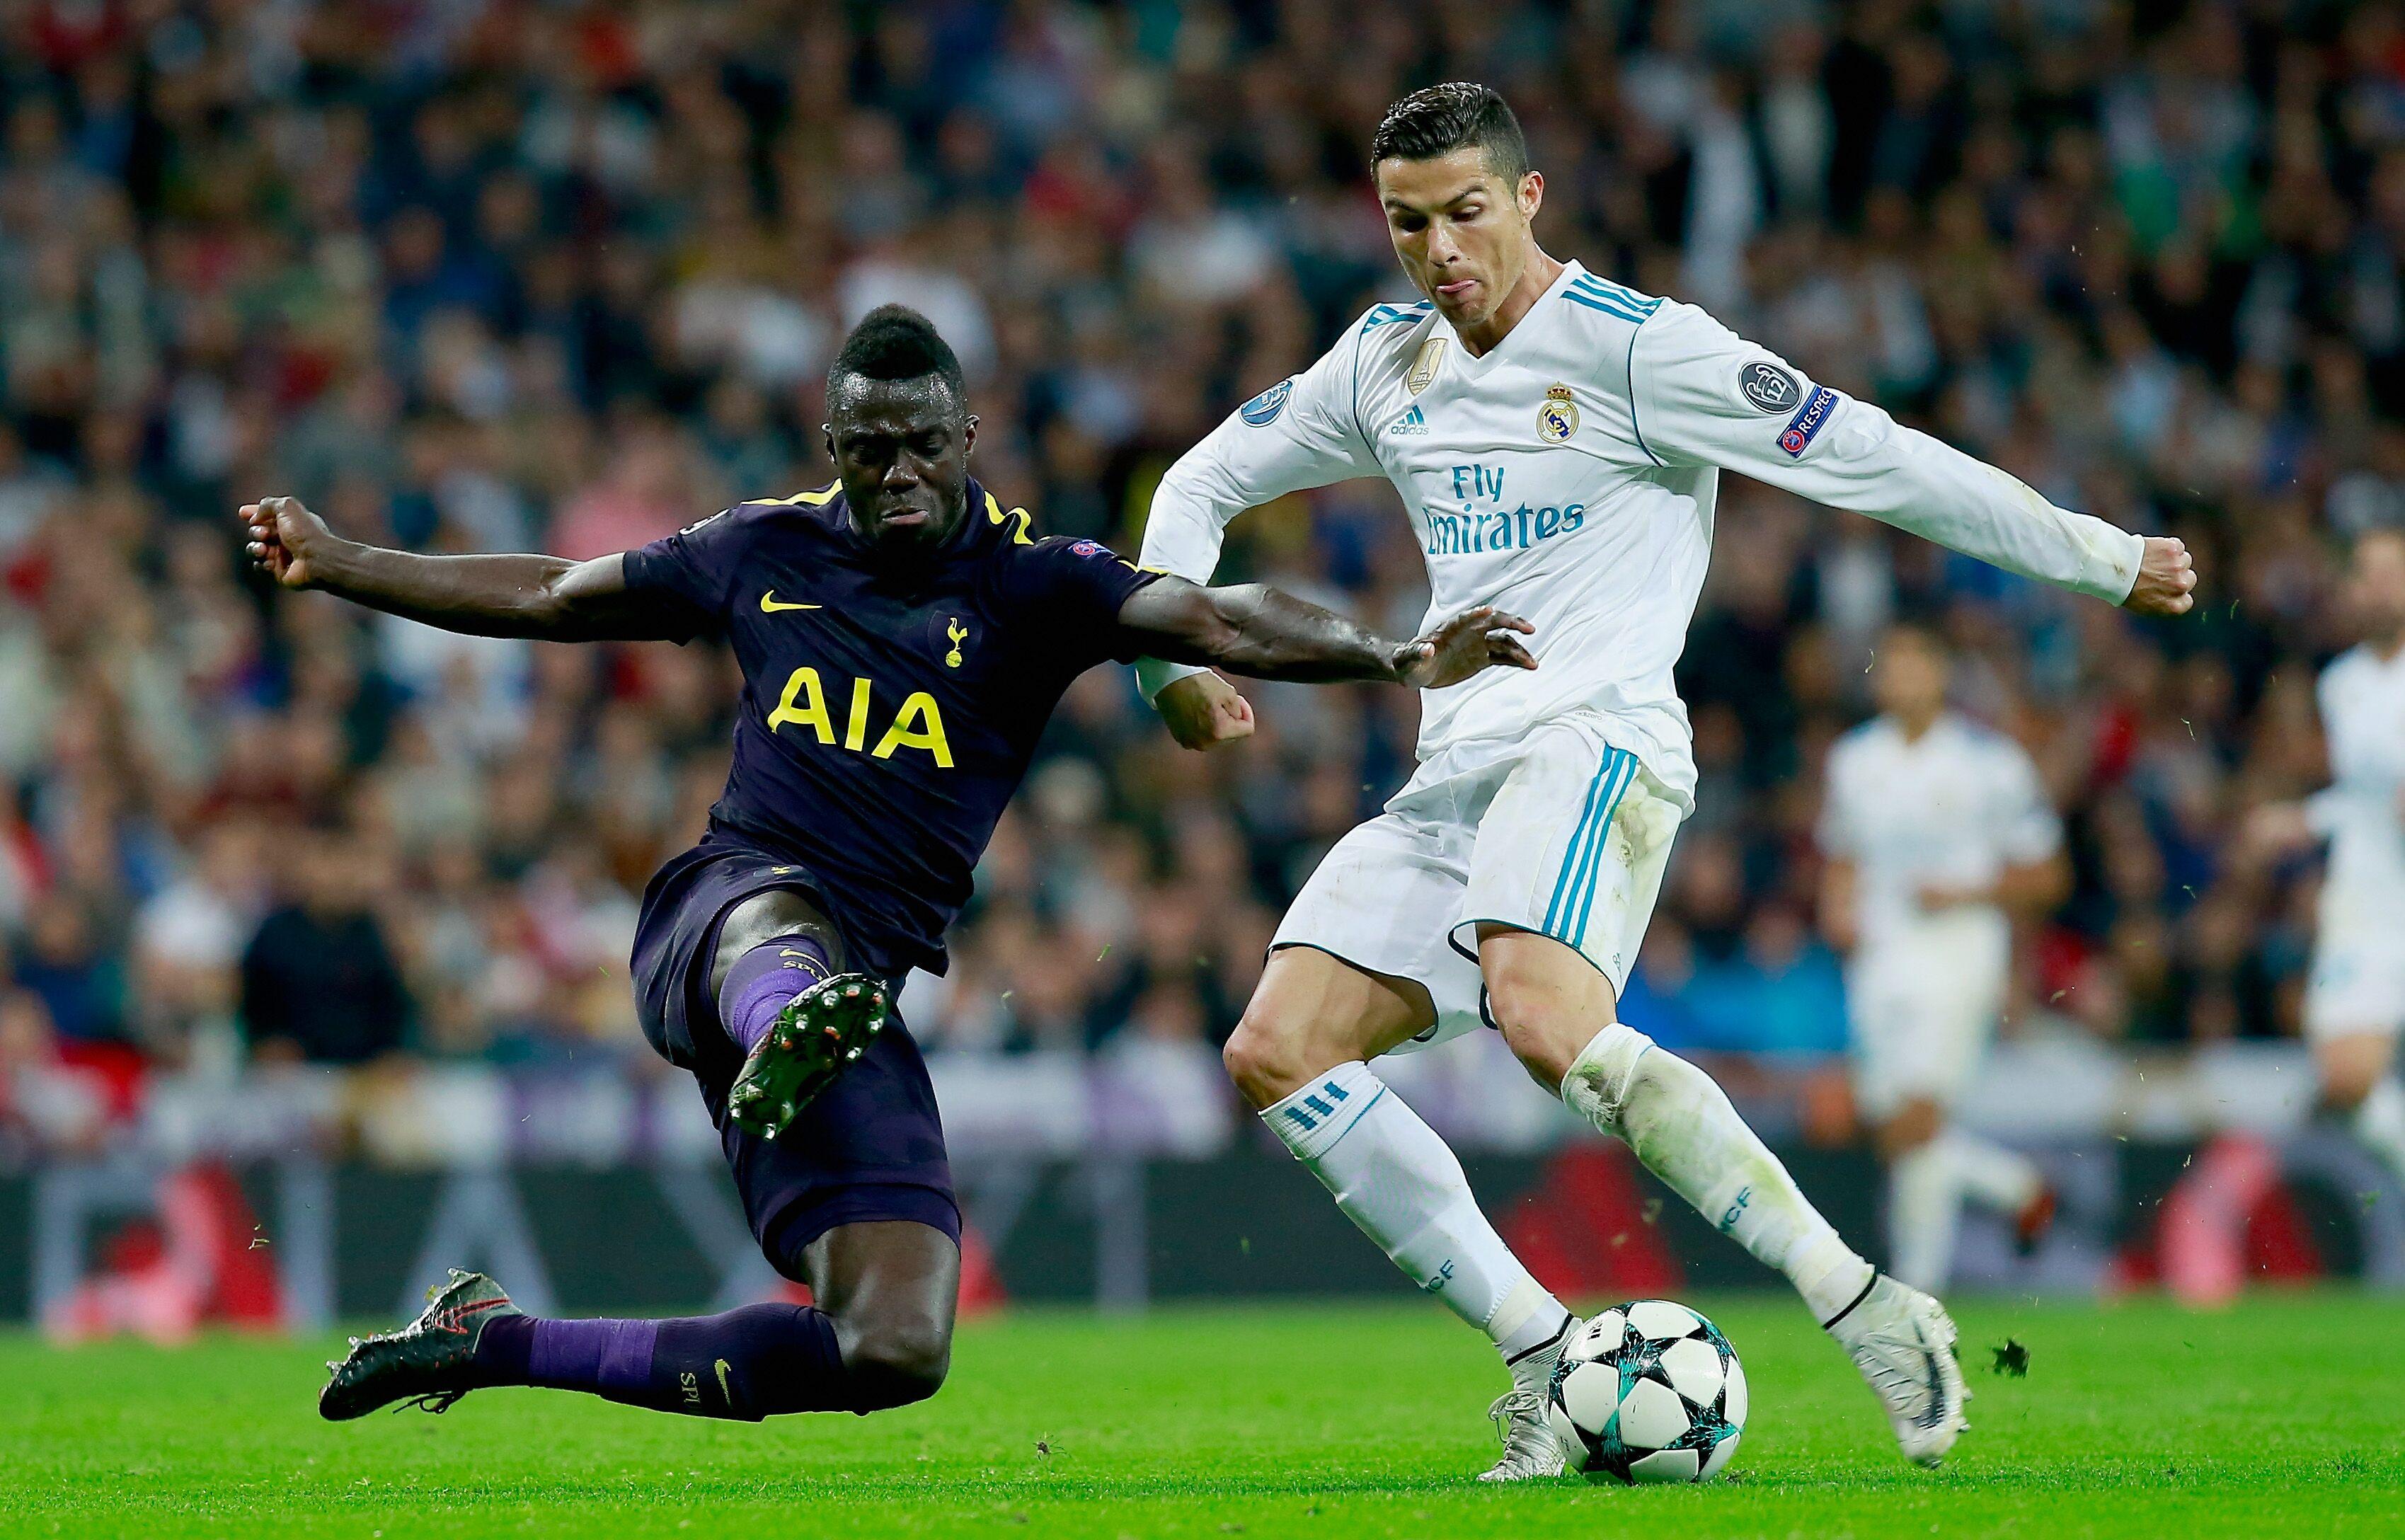 Tottenham's Harry Winks, Davinson Sanchez star vs. Real Madrid